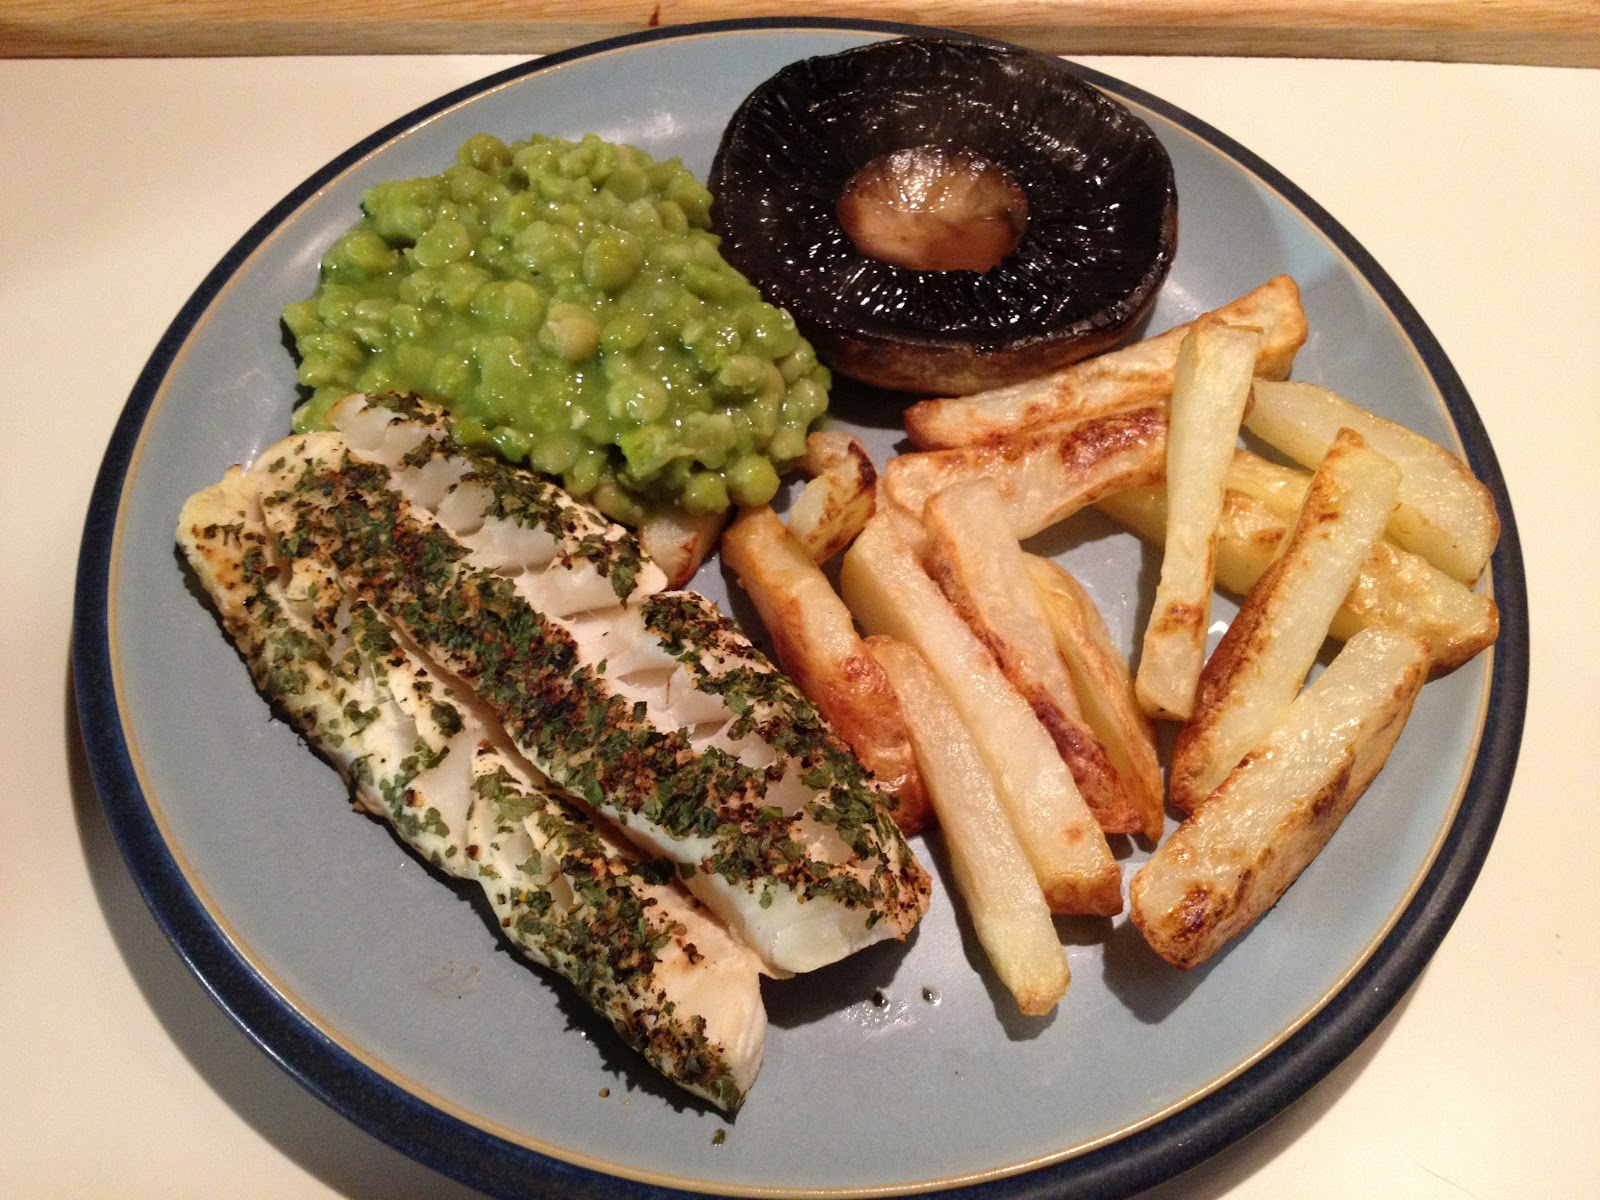 Robs Favourite Slimming World Recipes: Fish, Chips & Mushy ...